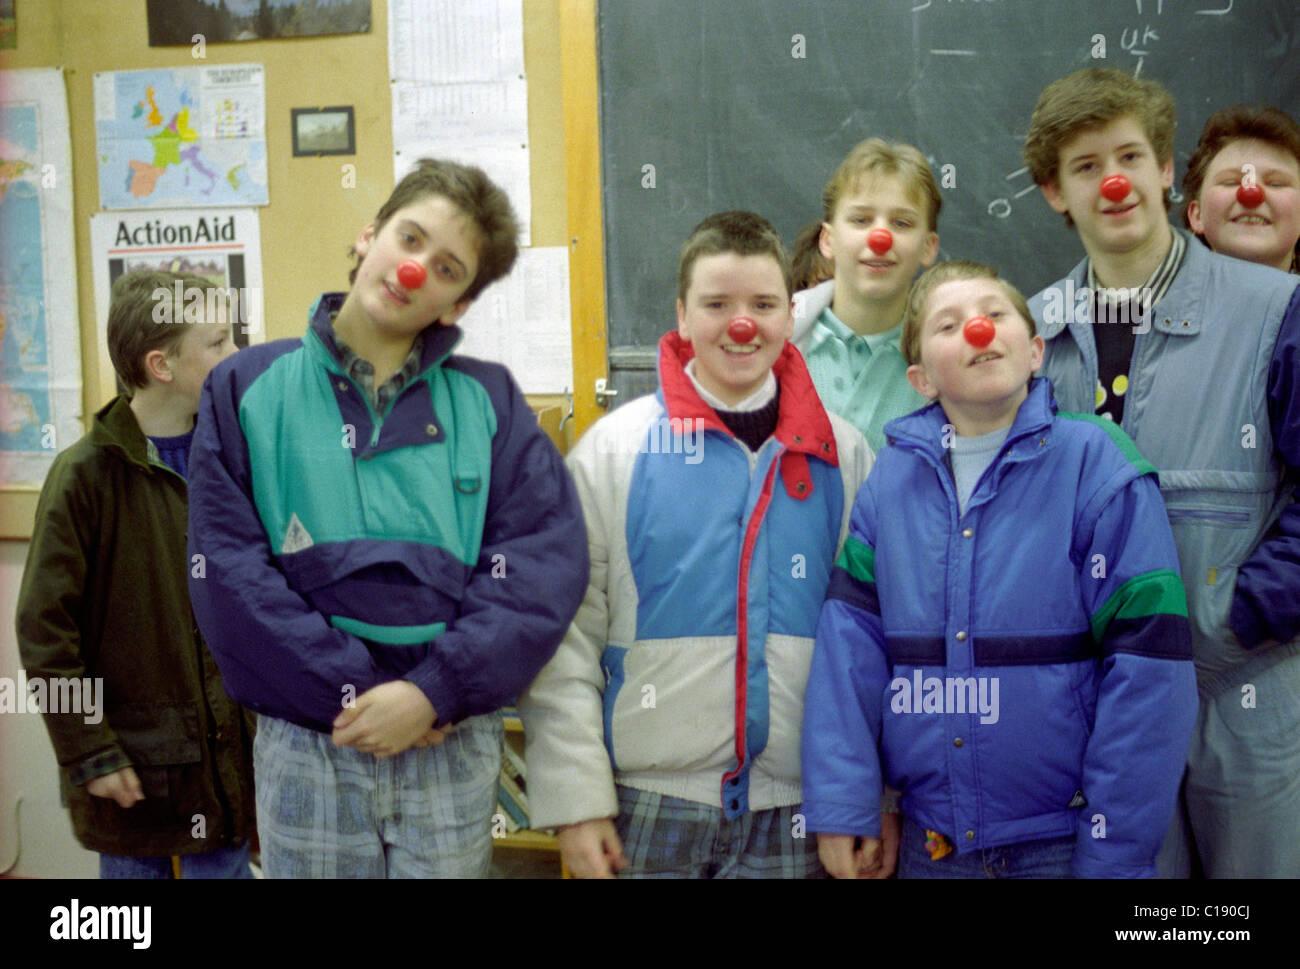 Comic Relief Stockfotos & Comic Relief Bilder - Alamy